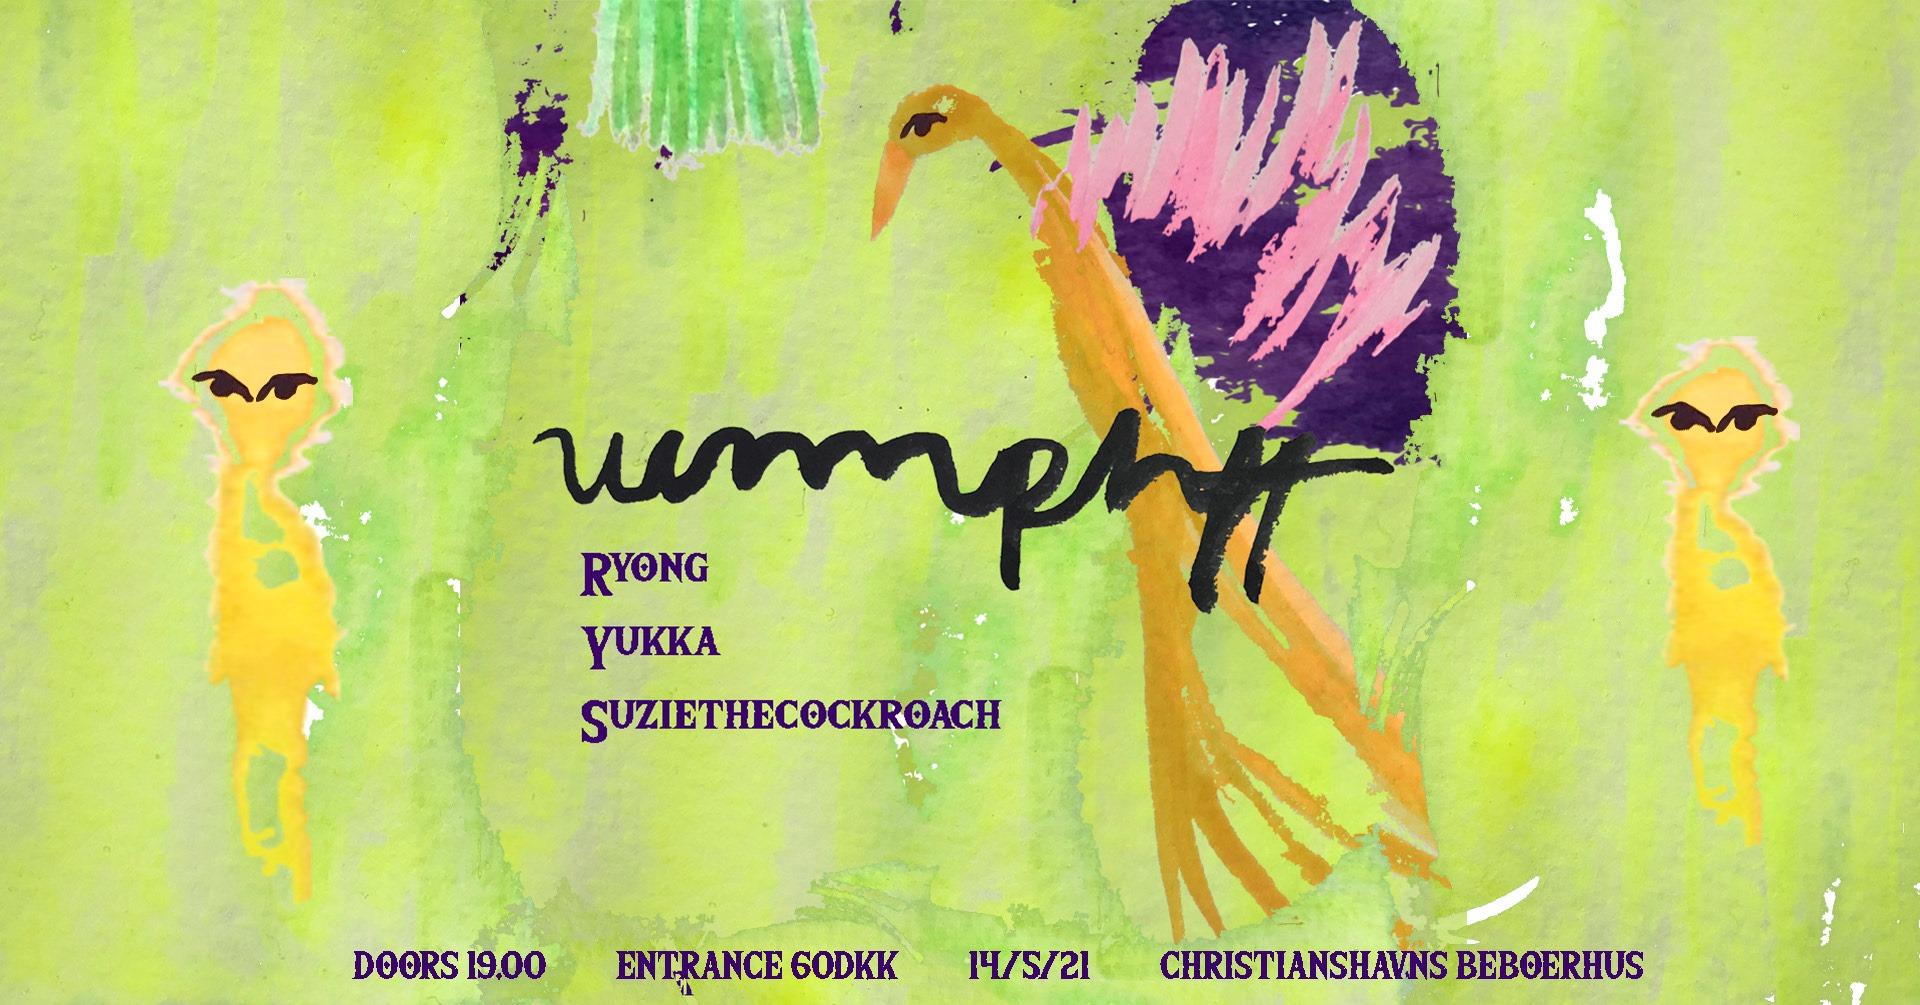 UUMPHFF: Ryong / Yukka / Suzie The cockroach